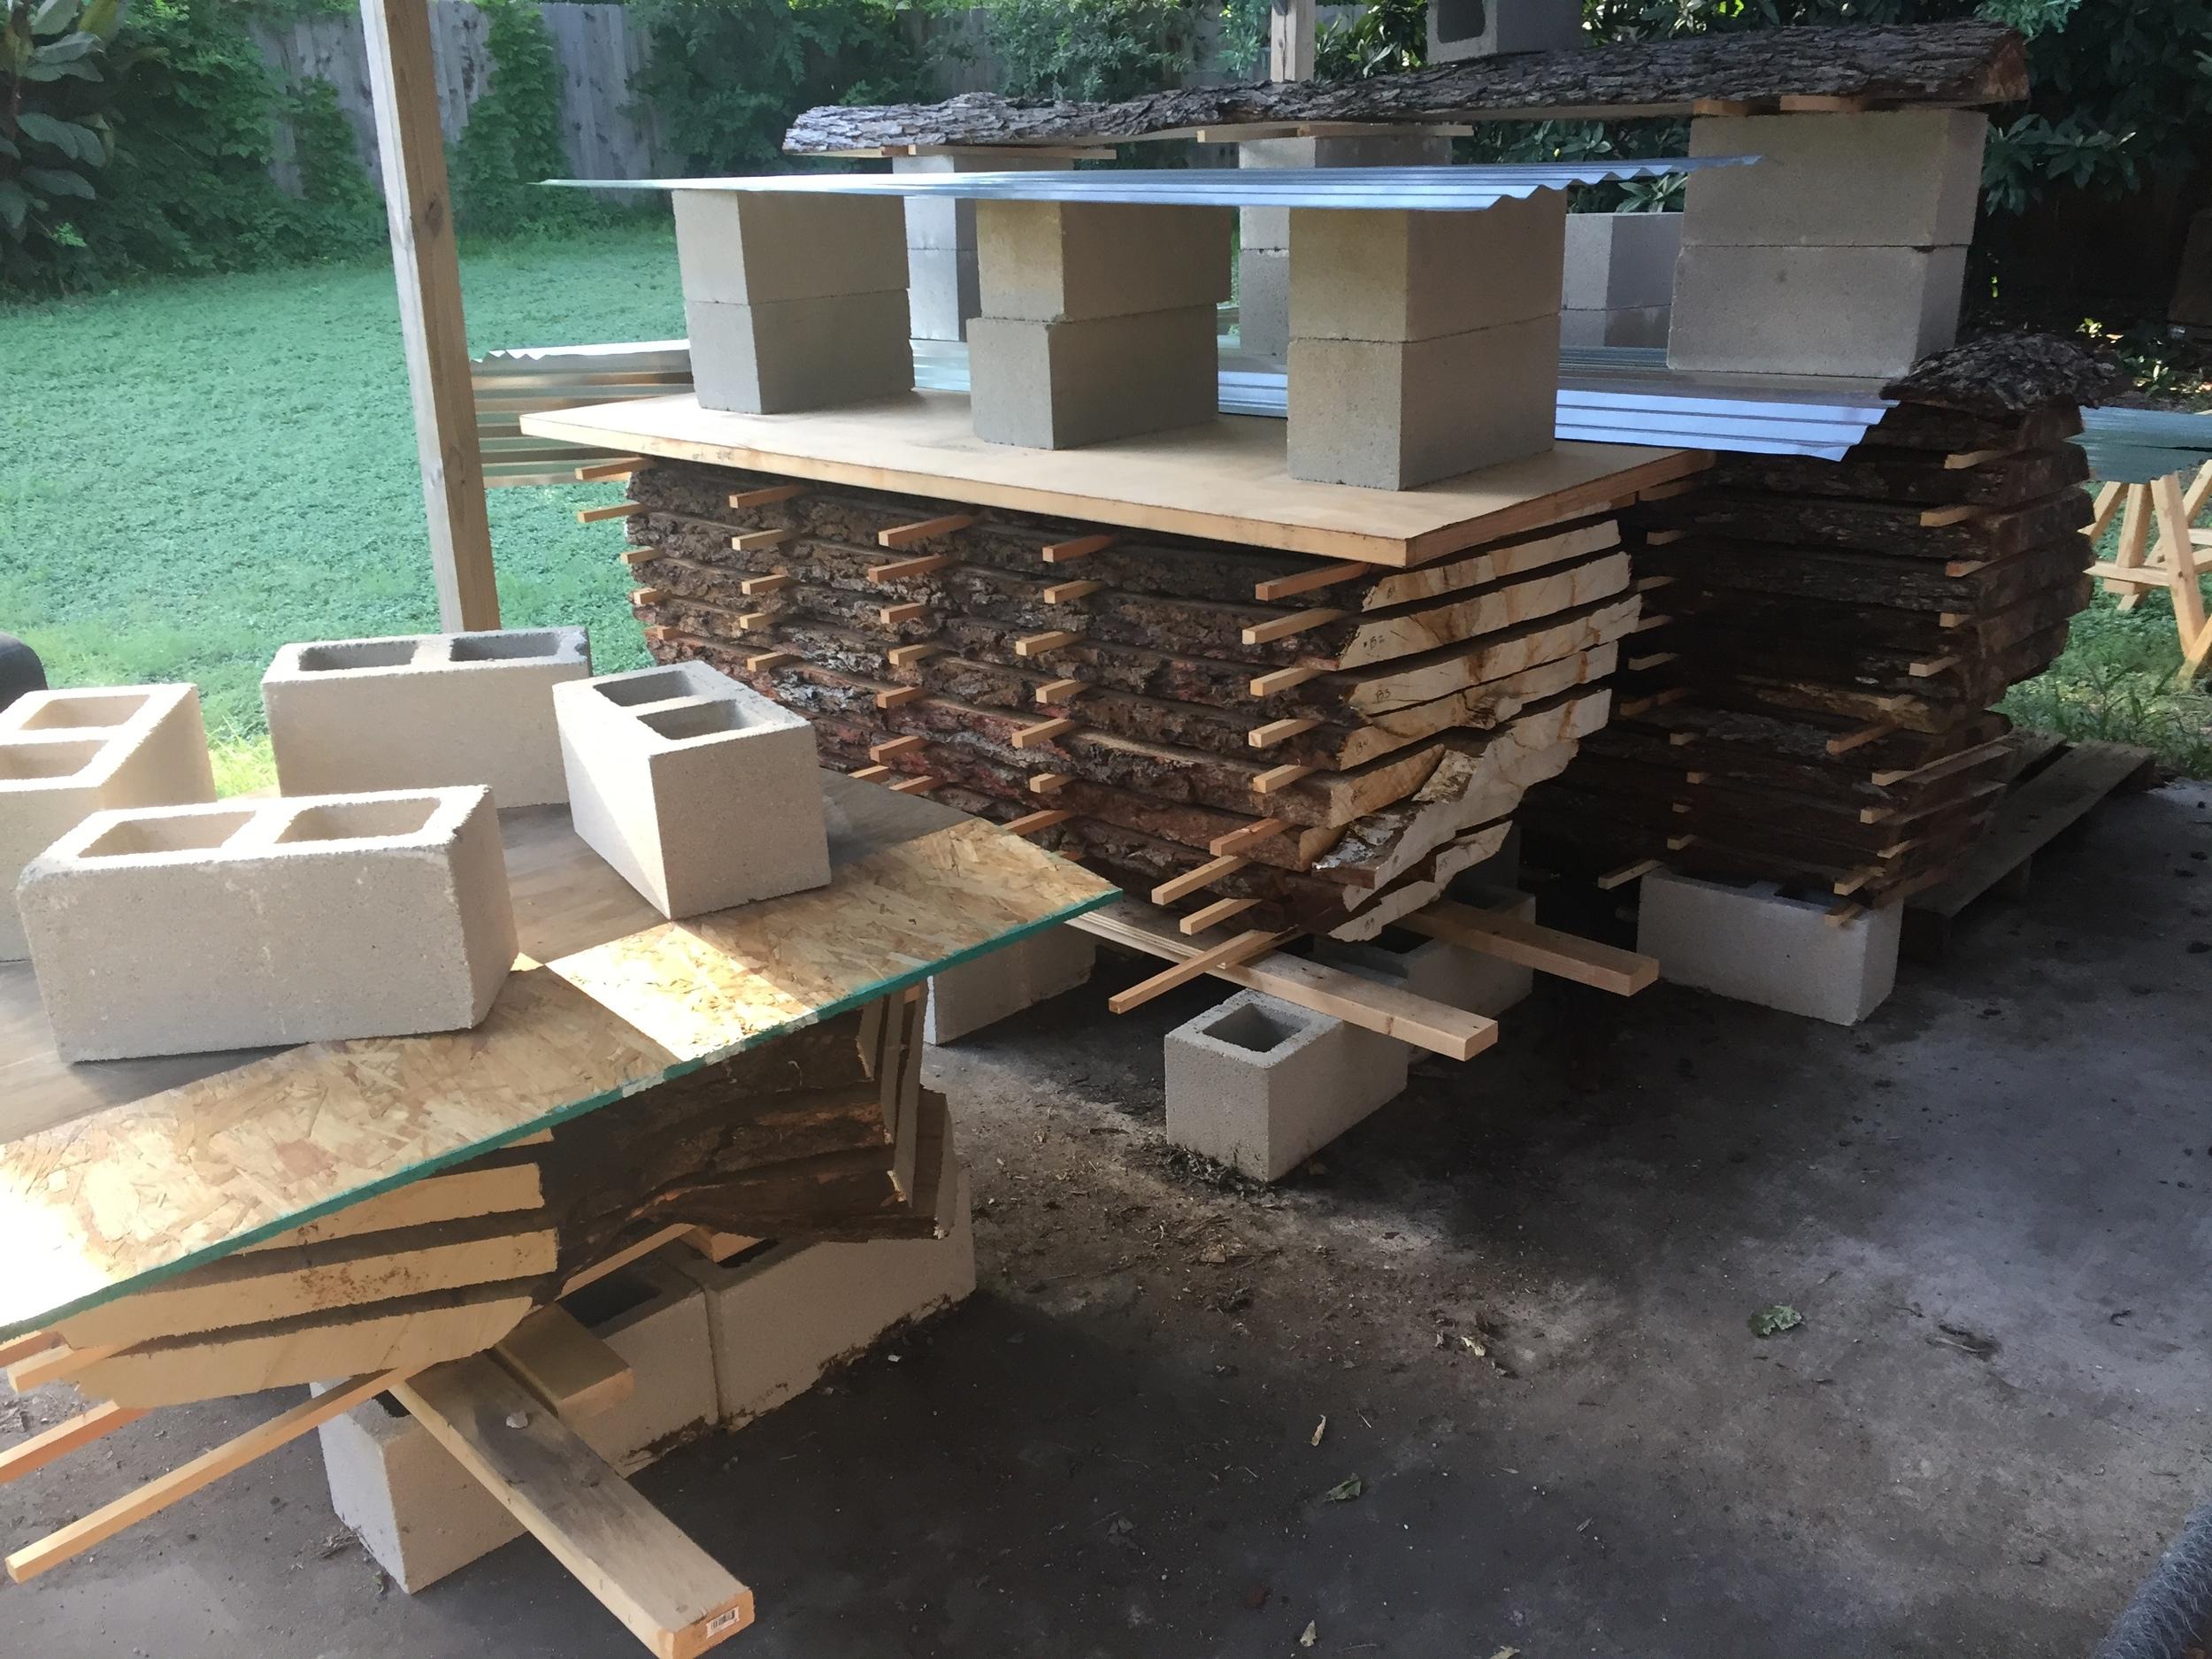 Beginnings of a Lumber yard